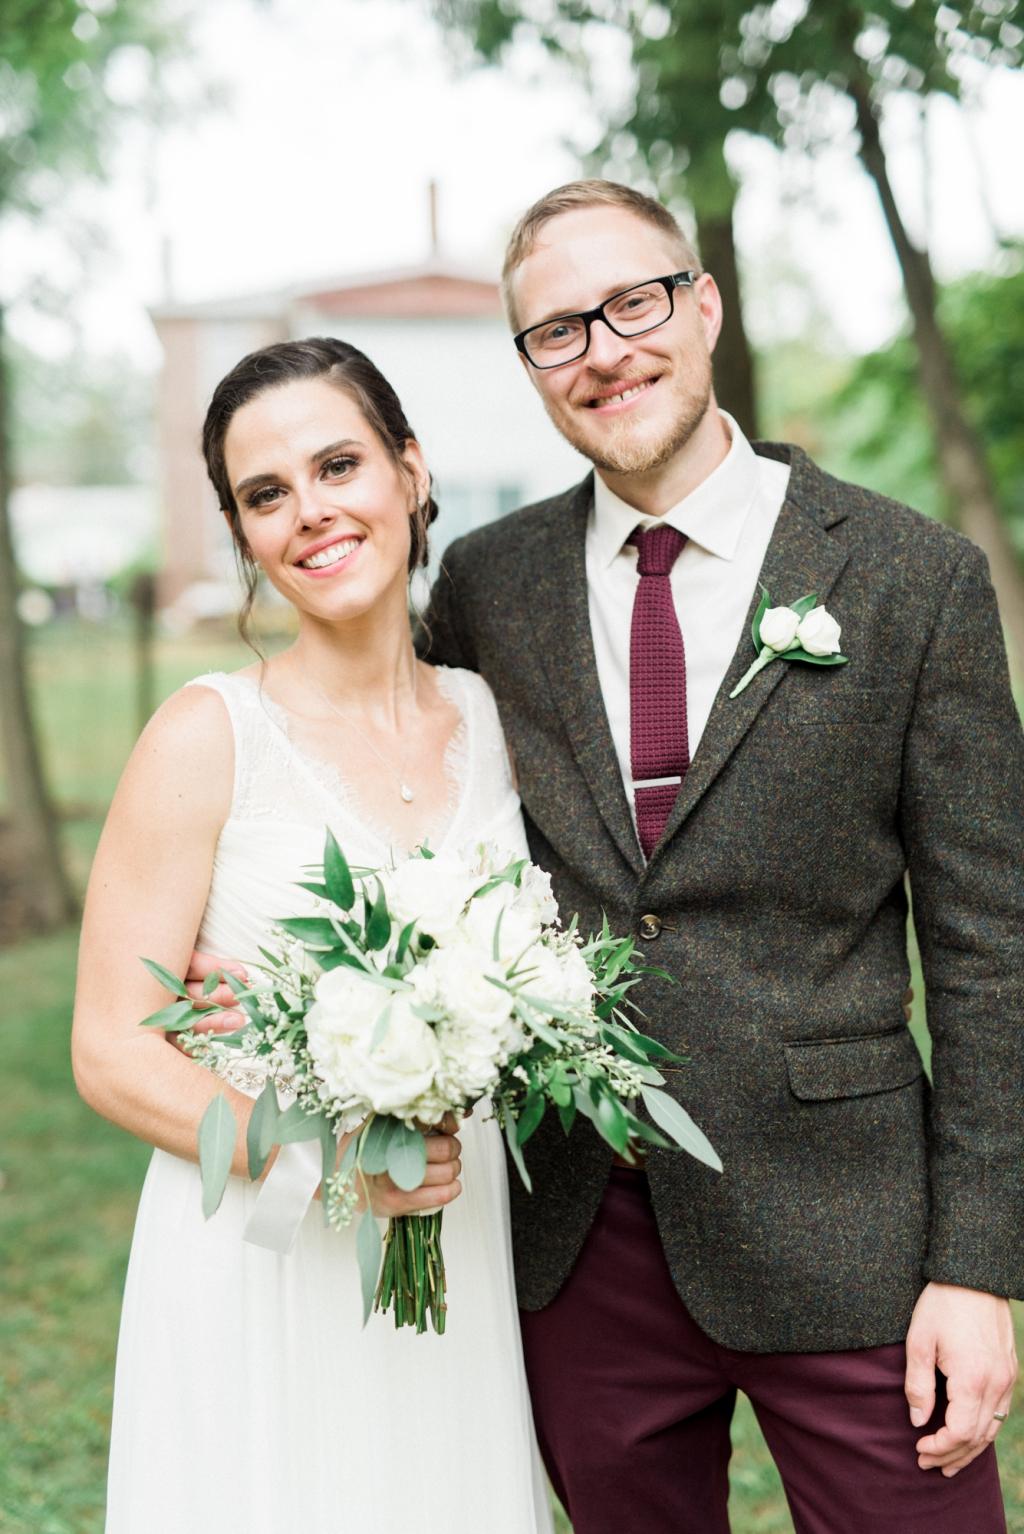 haley-richter-photography-new-jersey-backyard-wedding-107